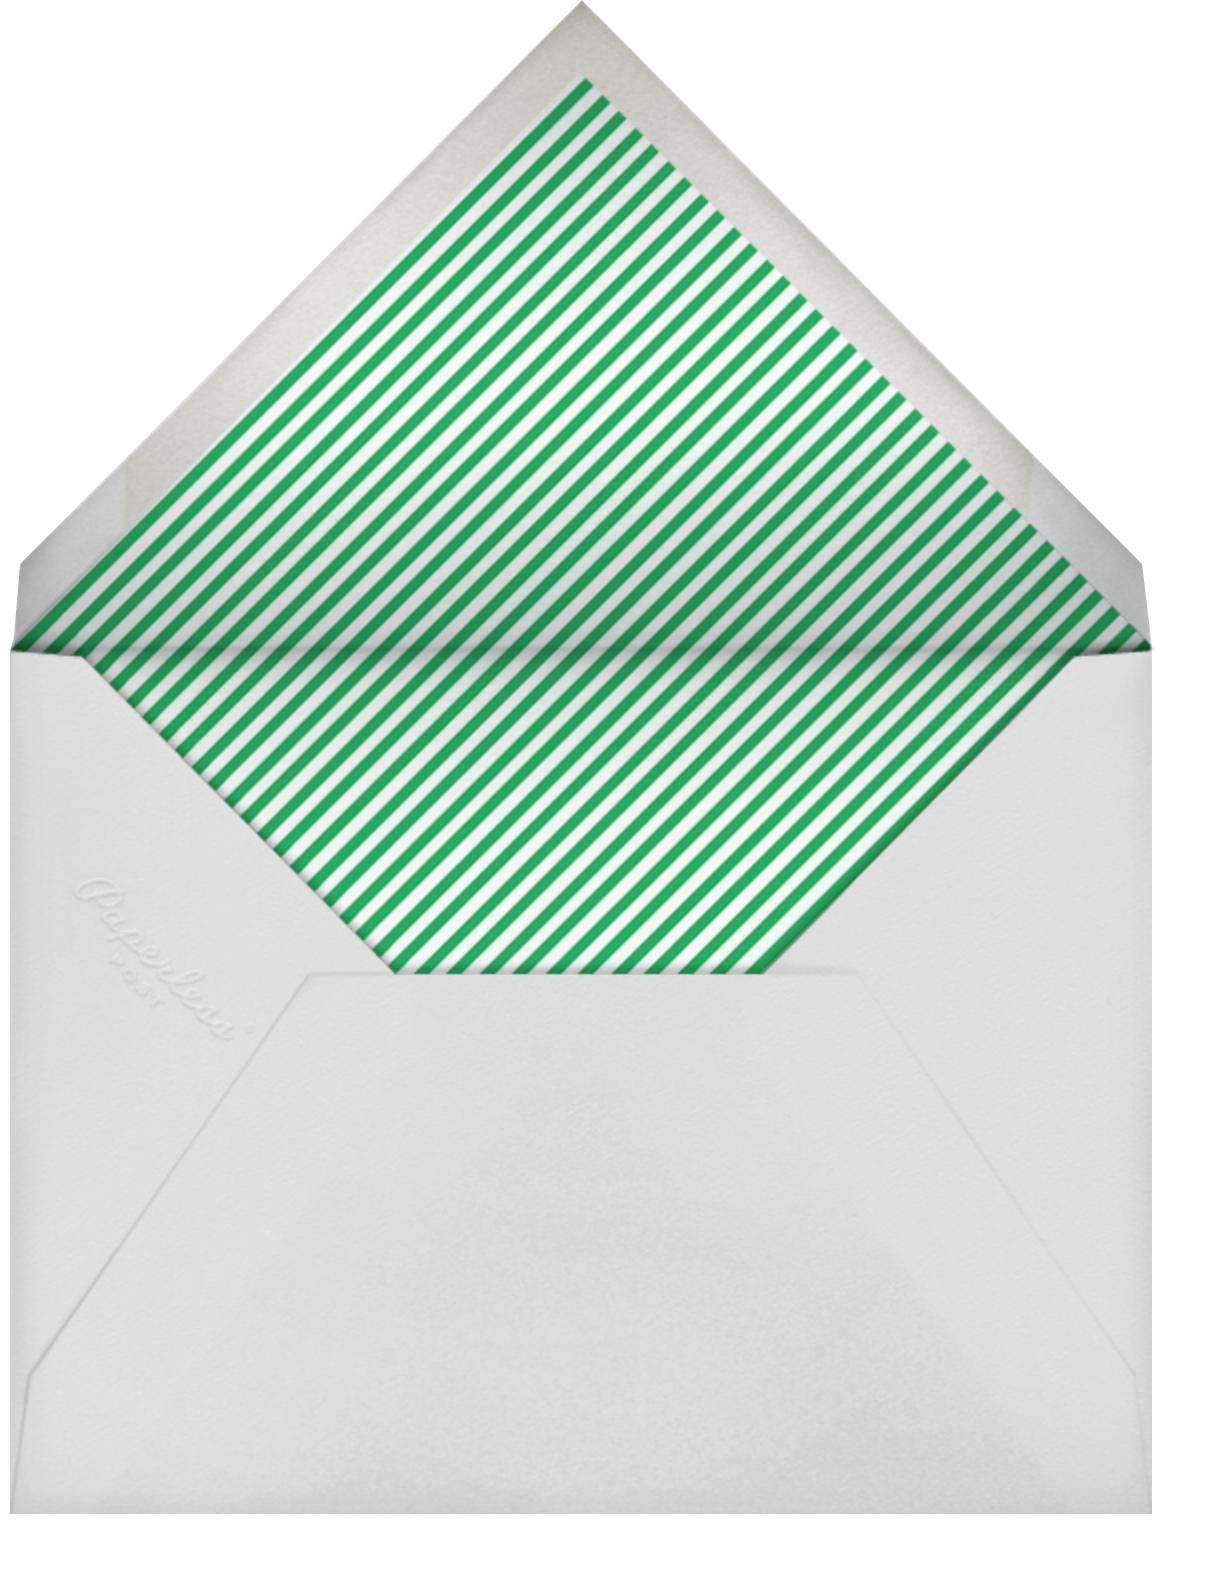 Flip The Burger - Yellow - Mr. Boddington's Studio - Barbecue - envelope back